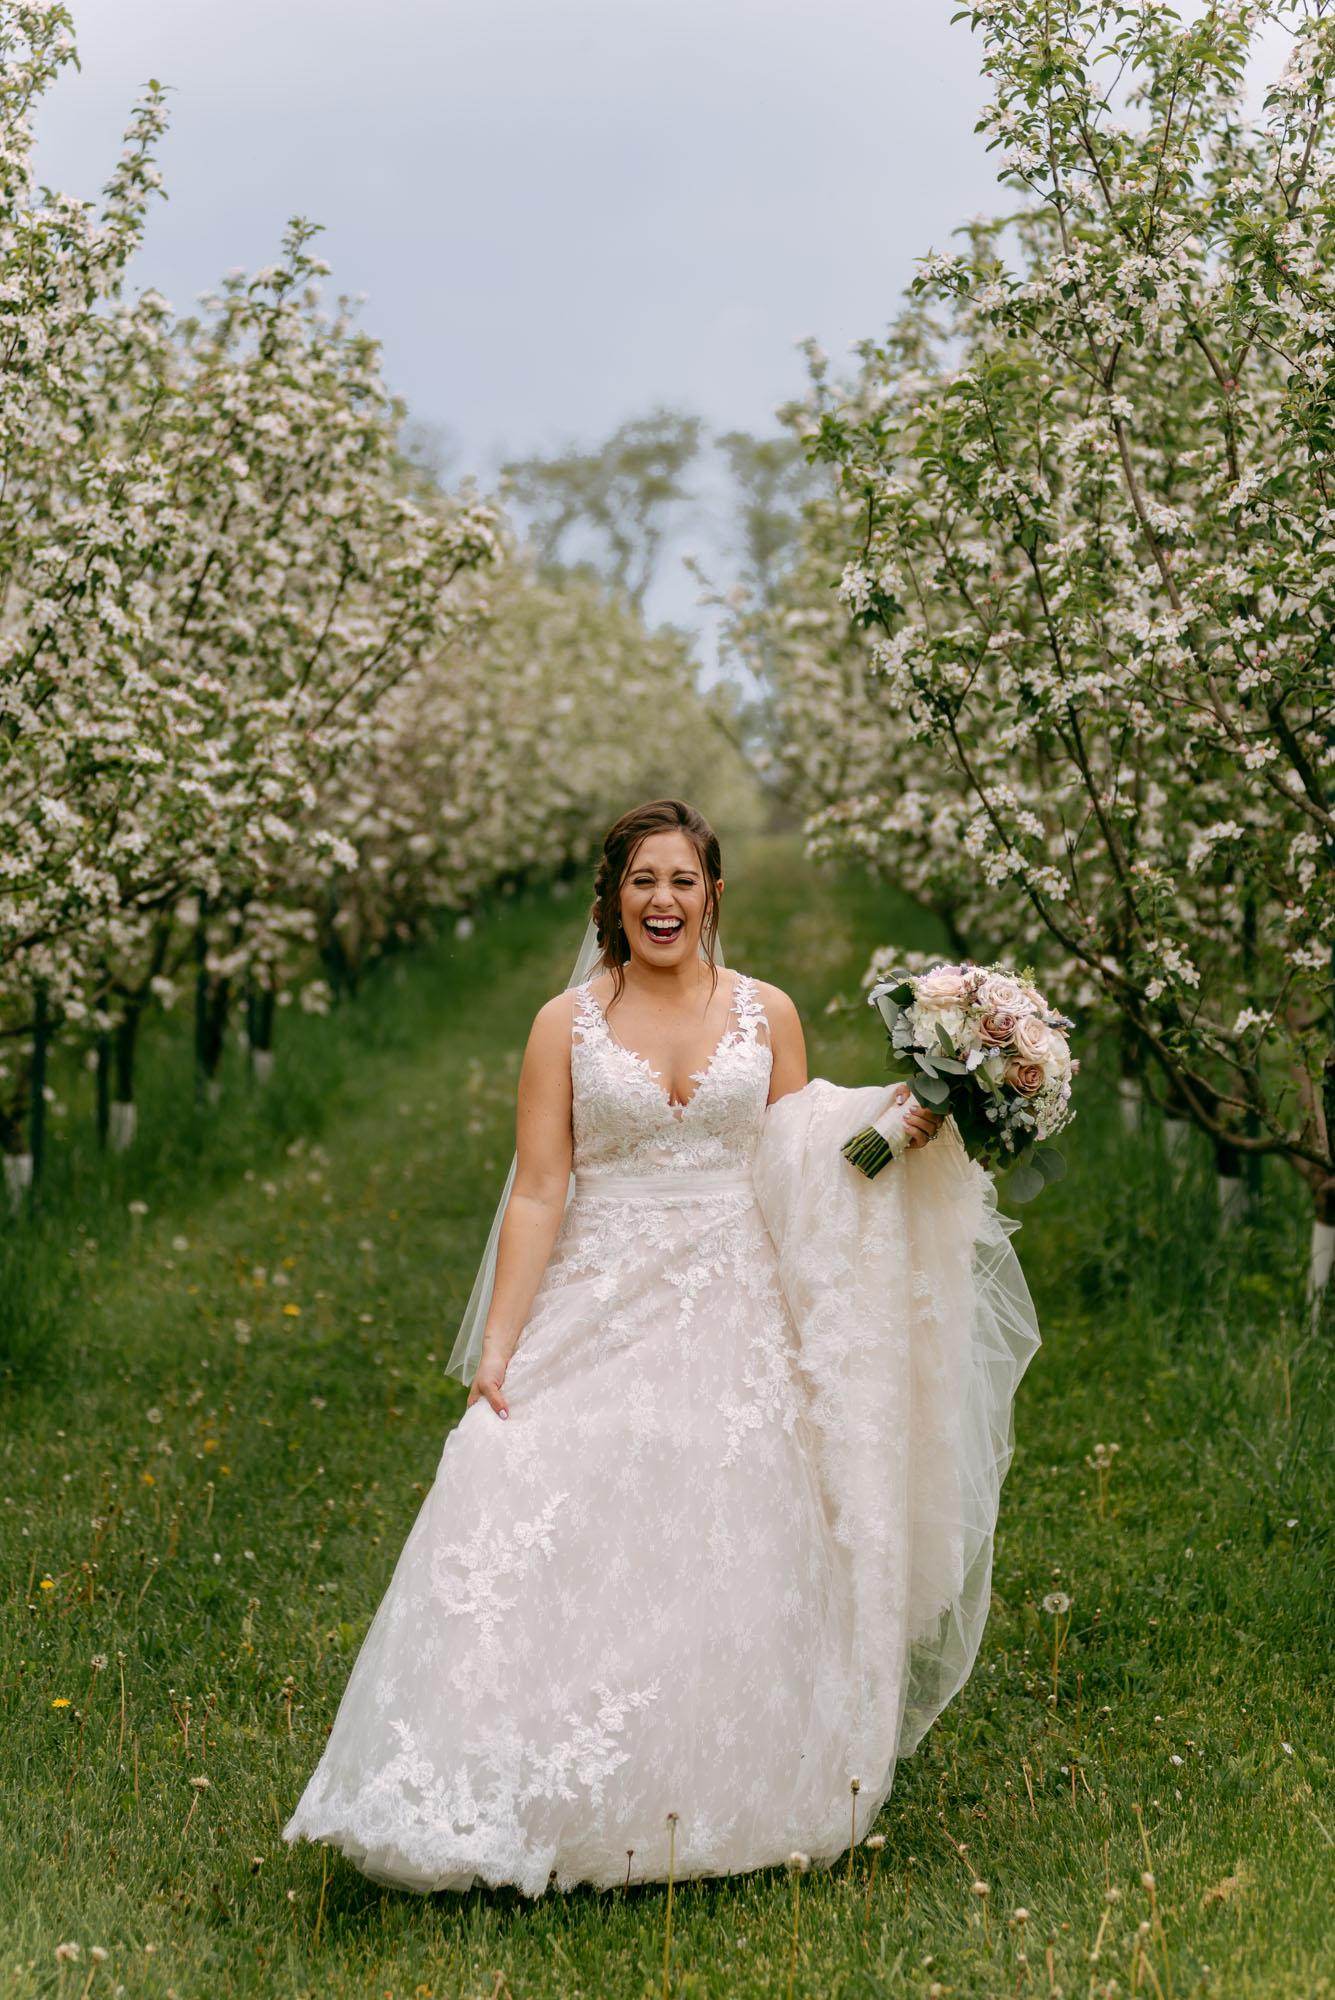 orchard-ridge-farms-pavillion-Rockton-IL-wedding-photographers-3.jpg